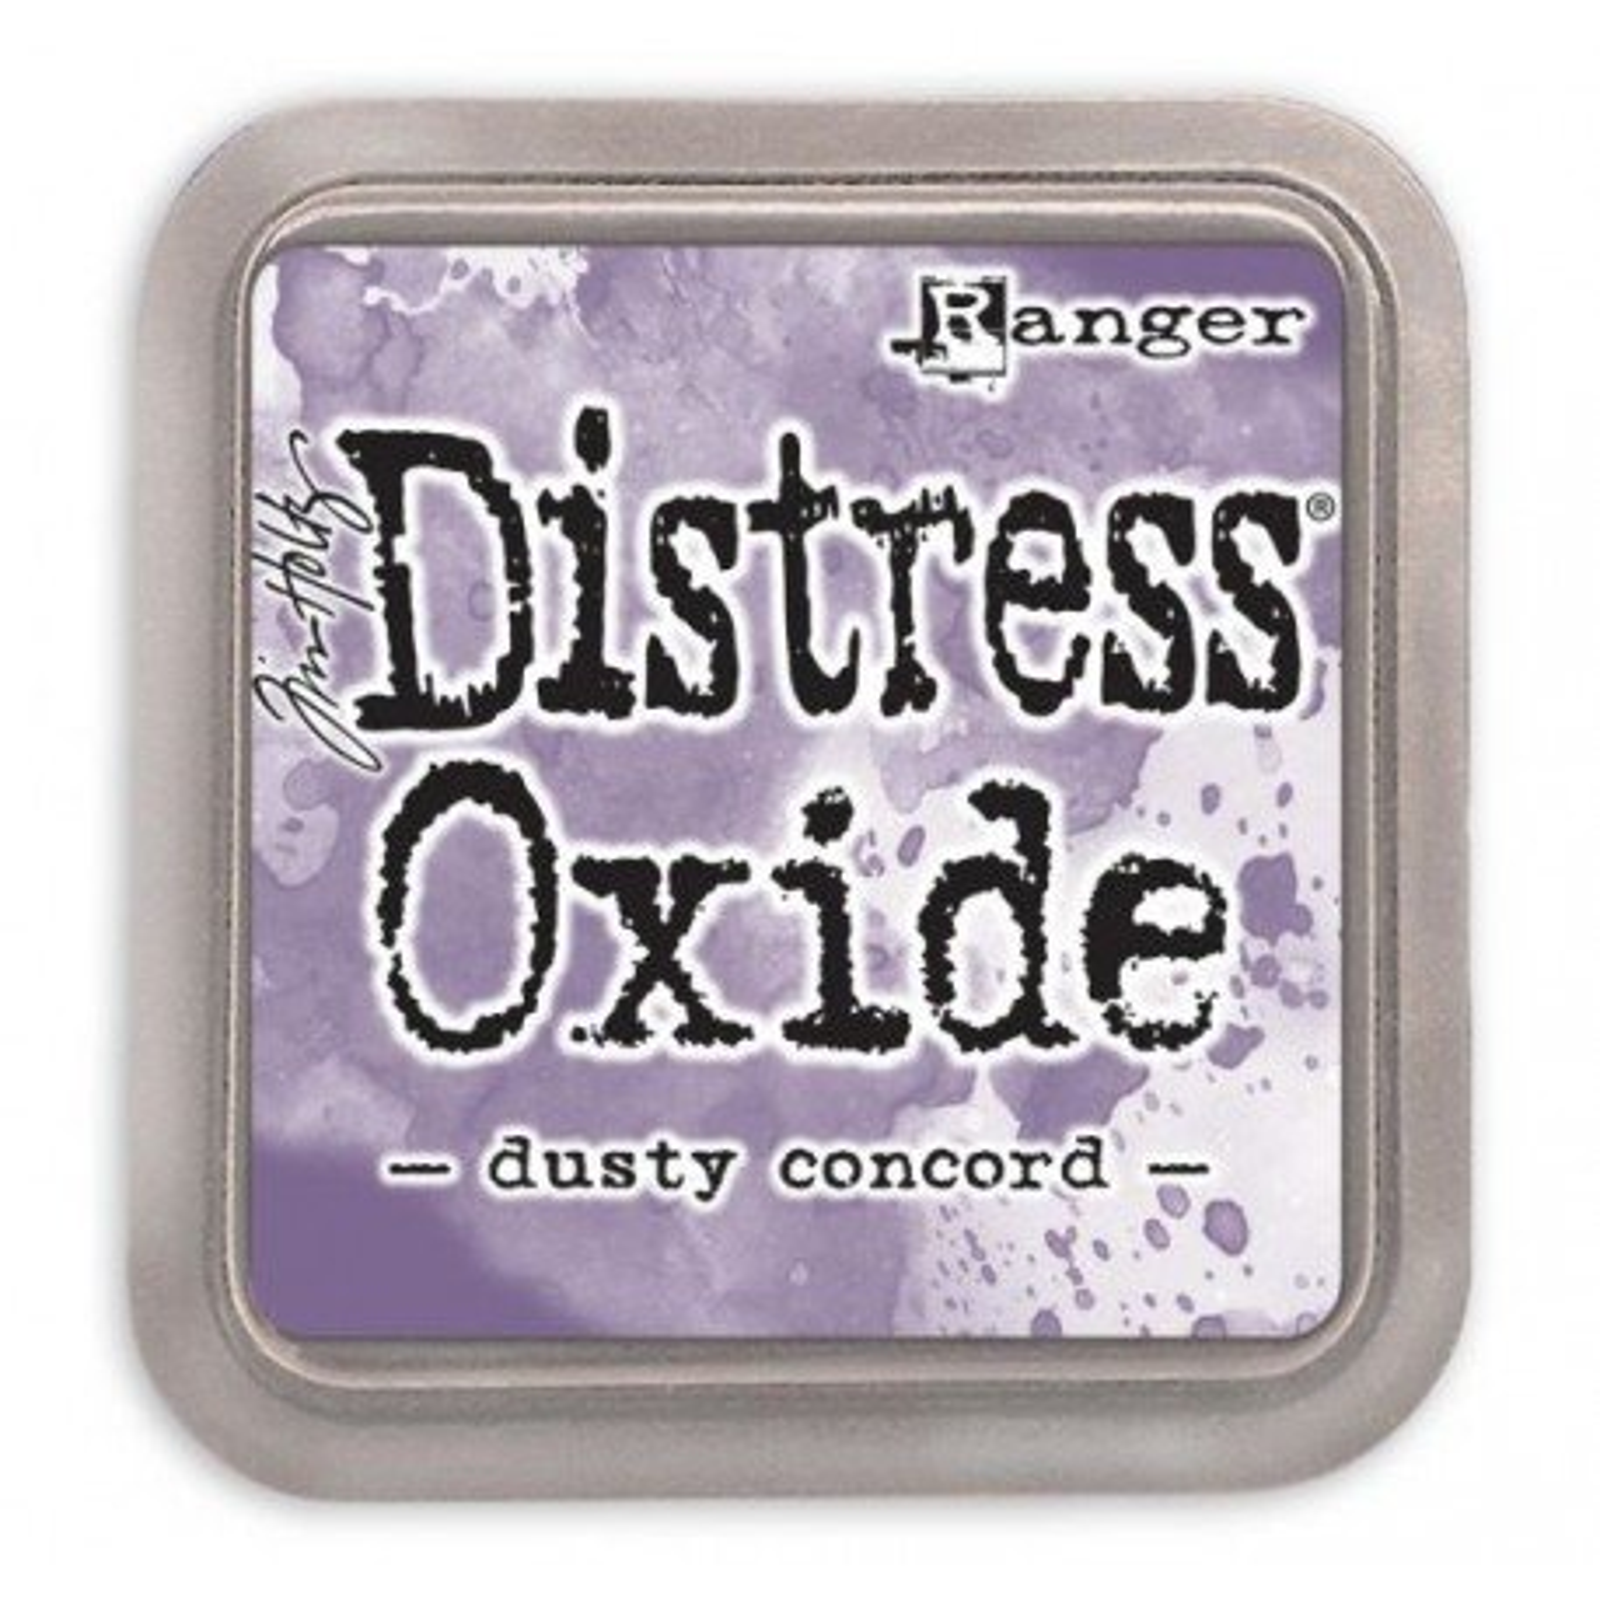 Grand encreur violet Distress Oxide - Dusty Concord - Ranger